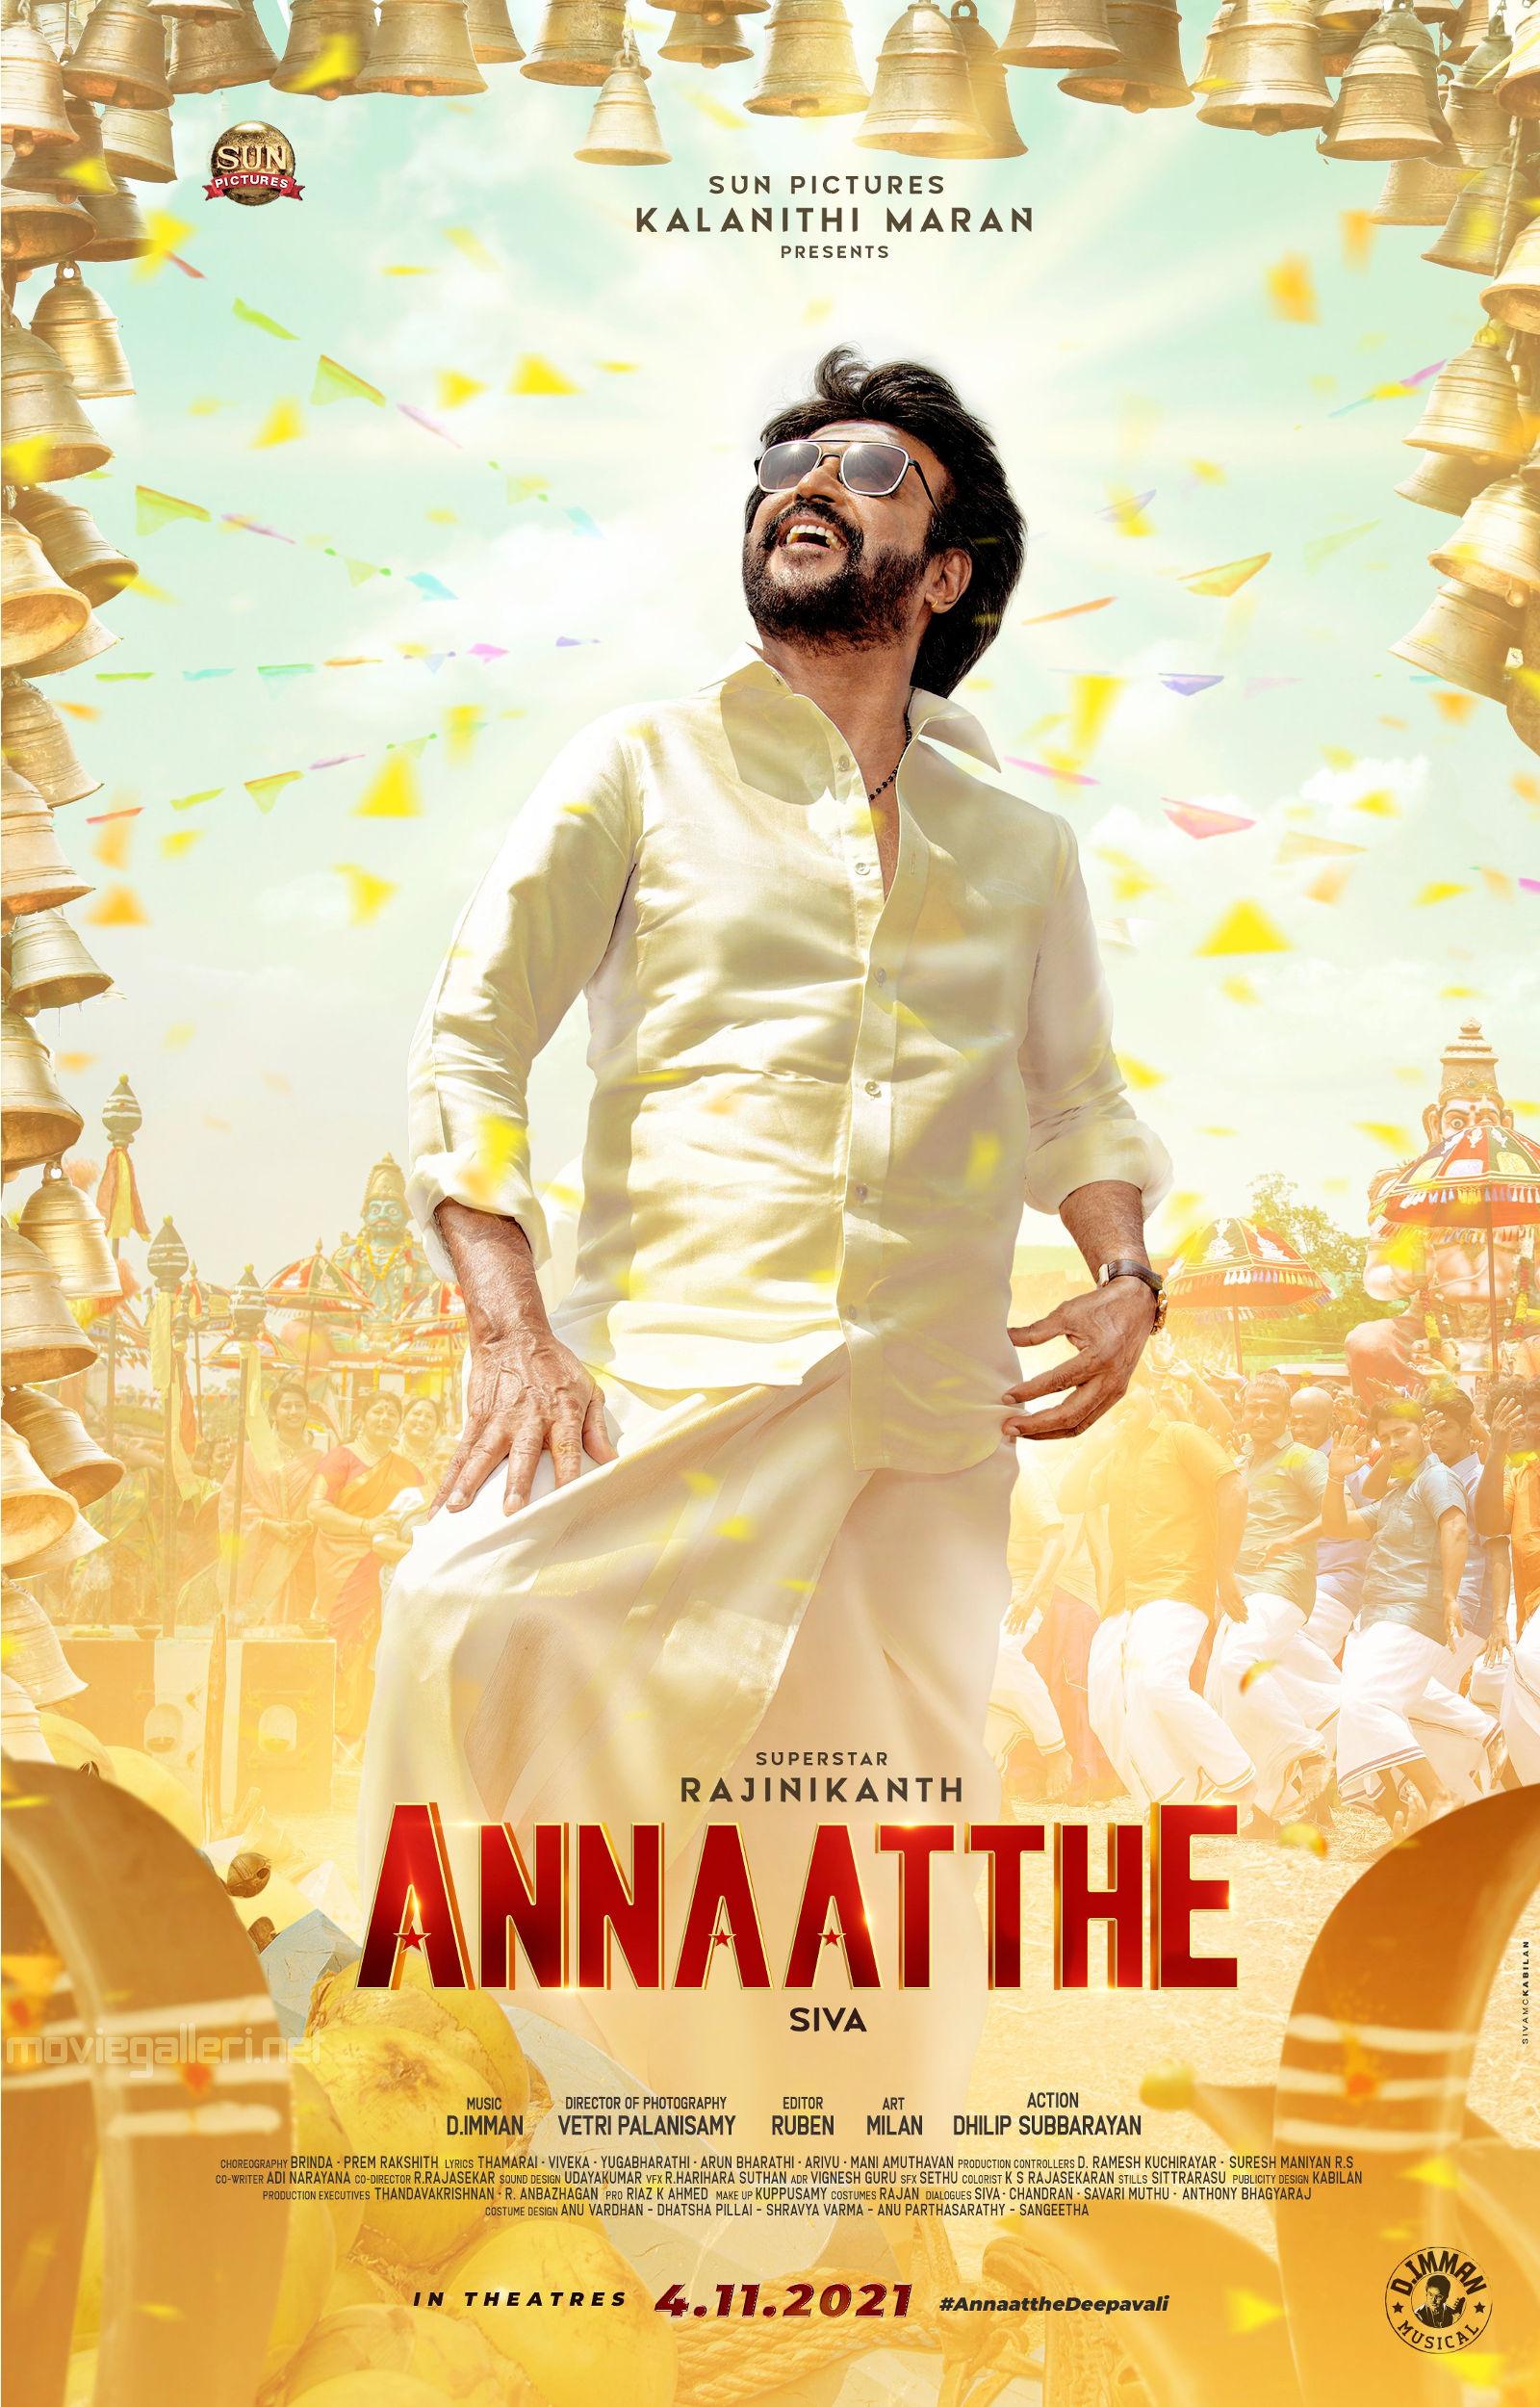 Rajinikanth Annathe First Look Poster HD